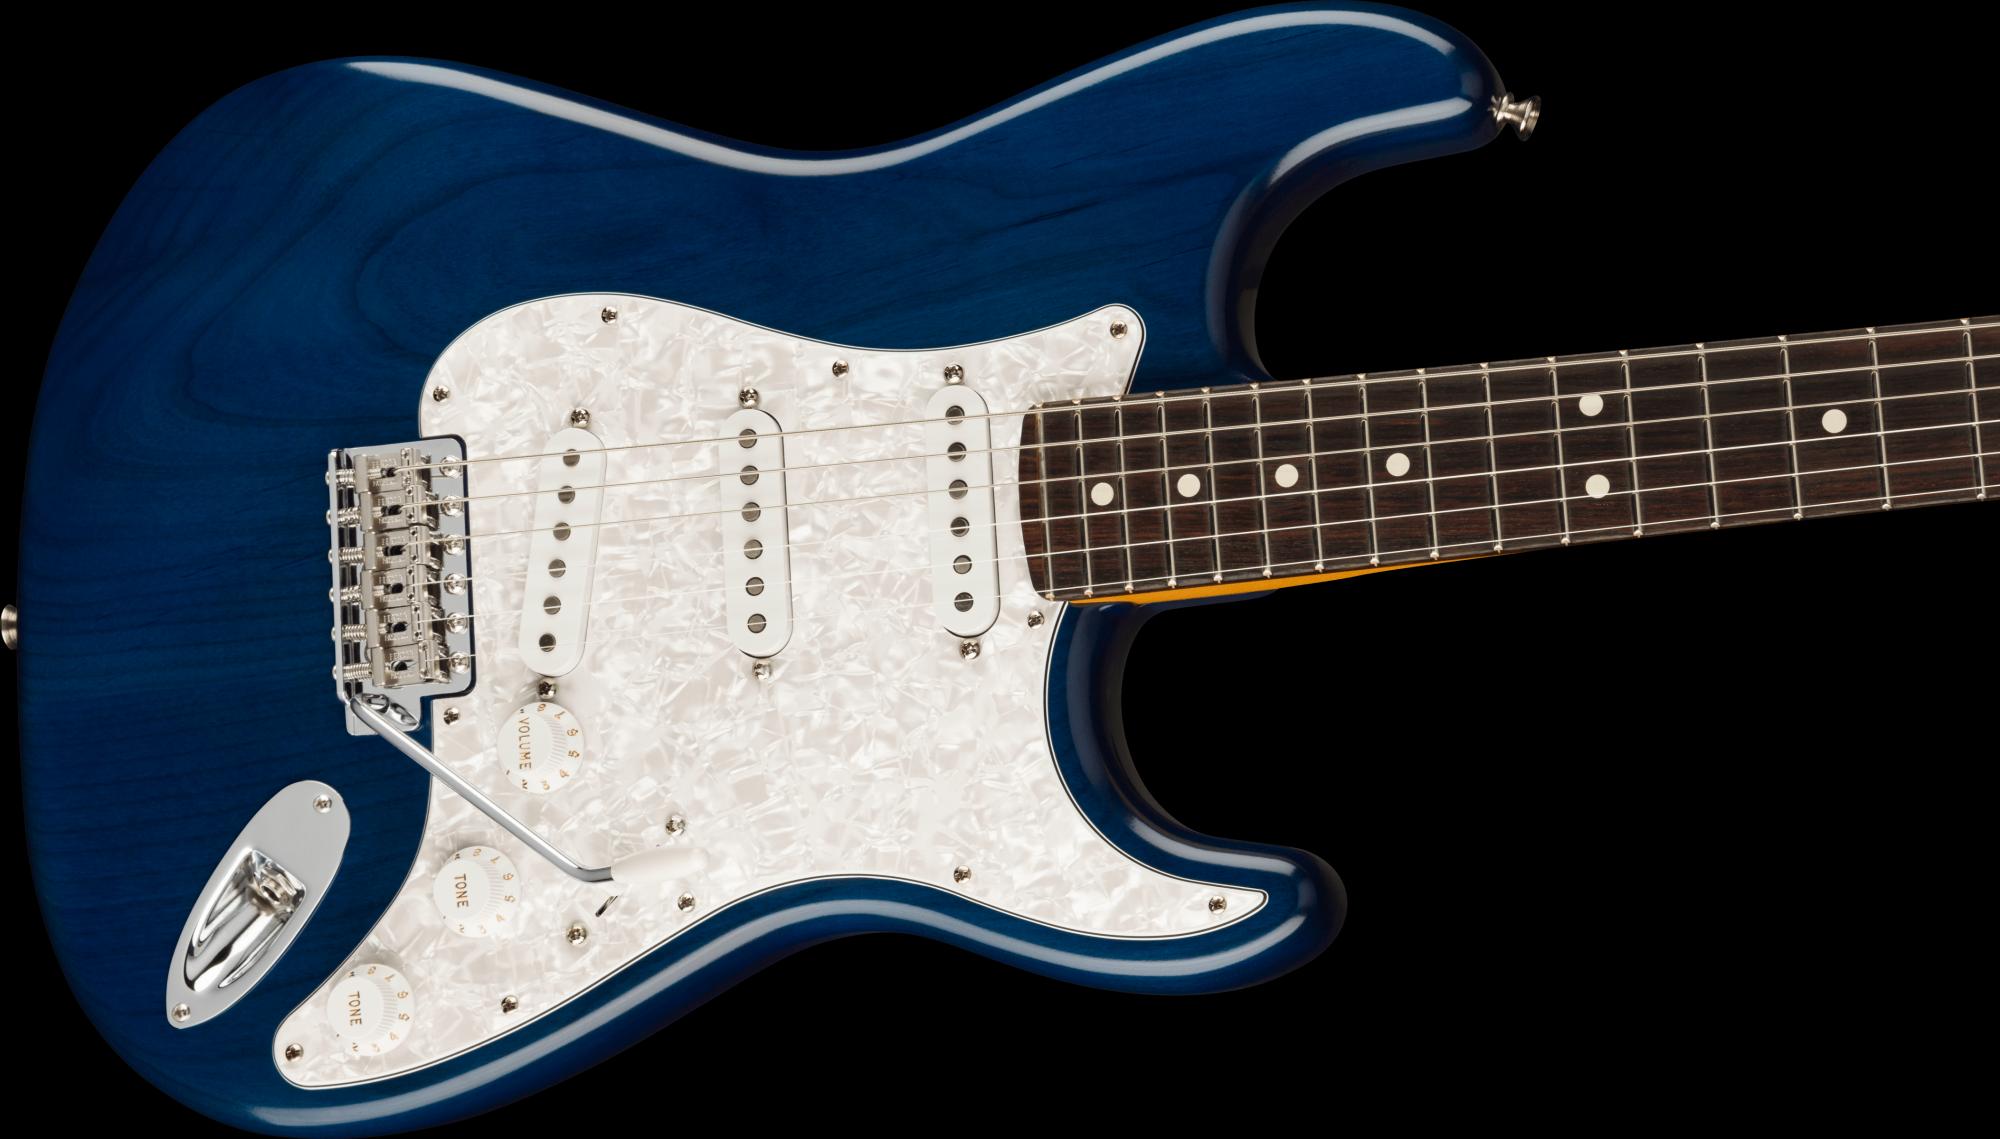 PRE-ORDER: Fender Cory Wong Stratocaster Rosewood Fingerboard - Sapphire Blue Transparent